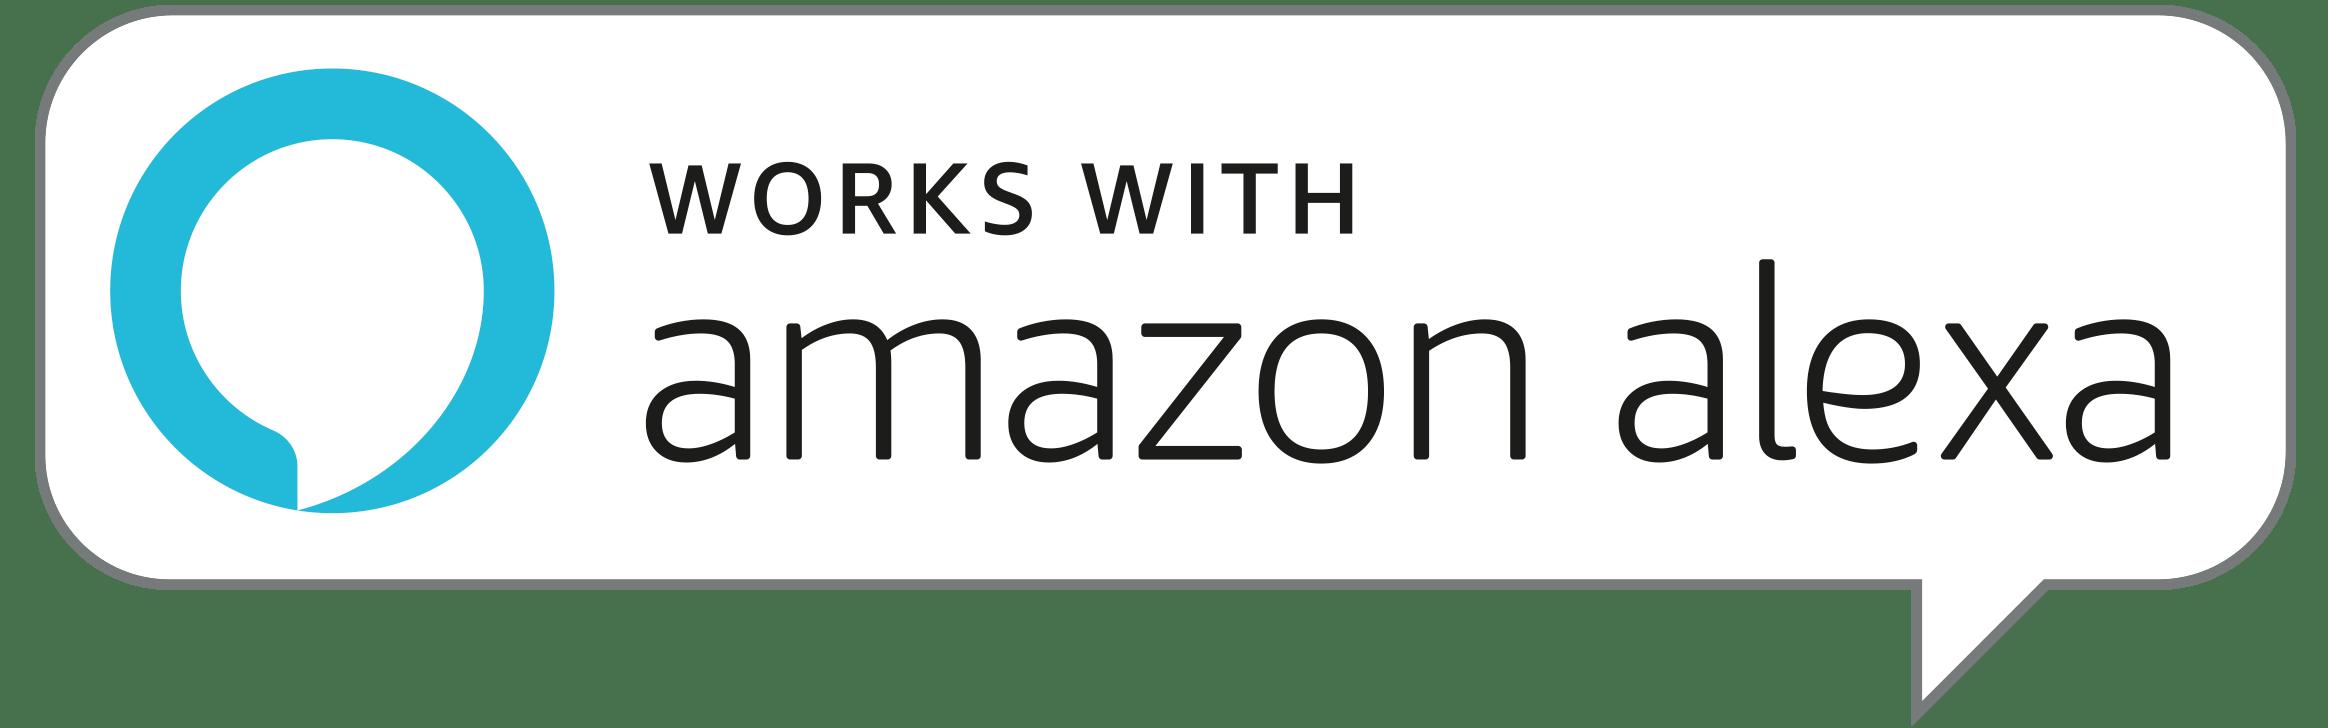 Compatible con Amazon Alexa - Entrega Inmediata Colombia